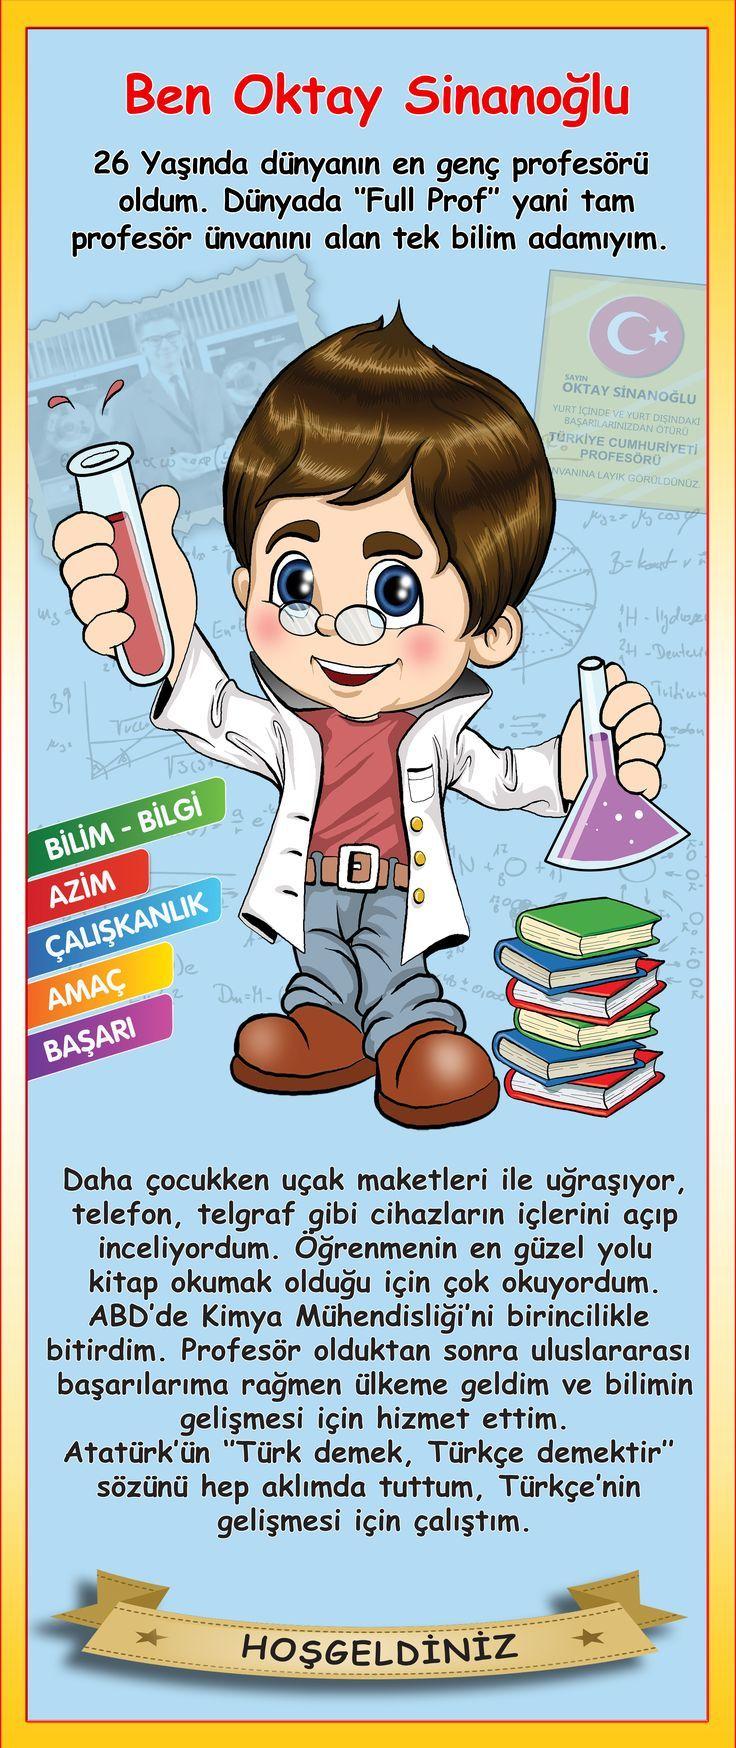 24 Eğitim http://turkrazzi.com/ppost/436004807664361373/ [] #